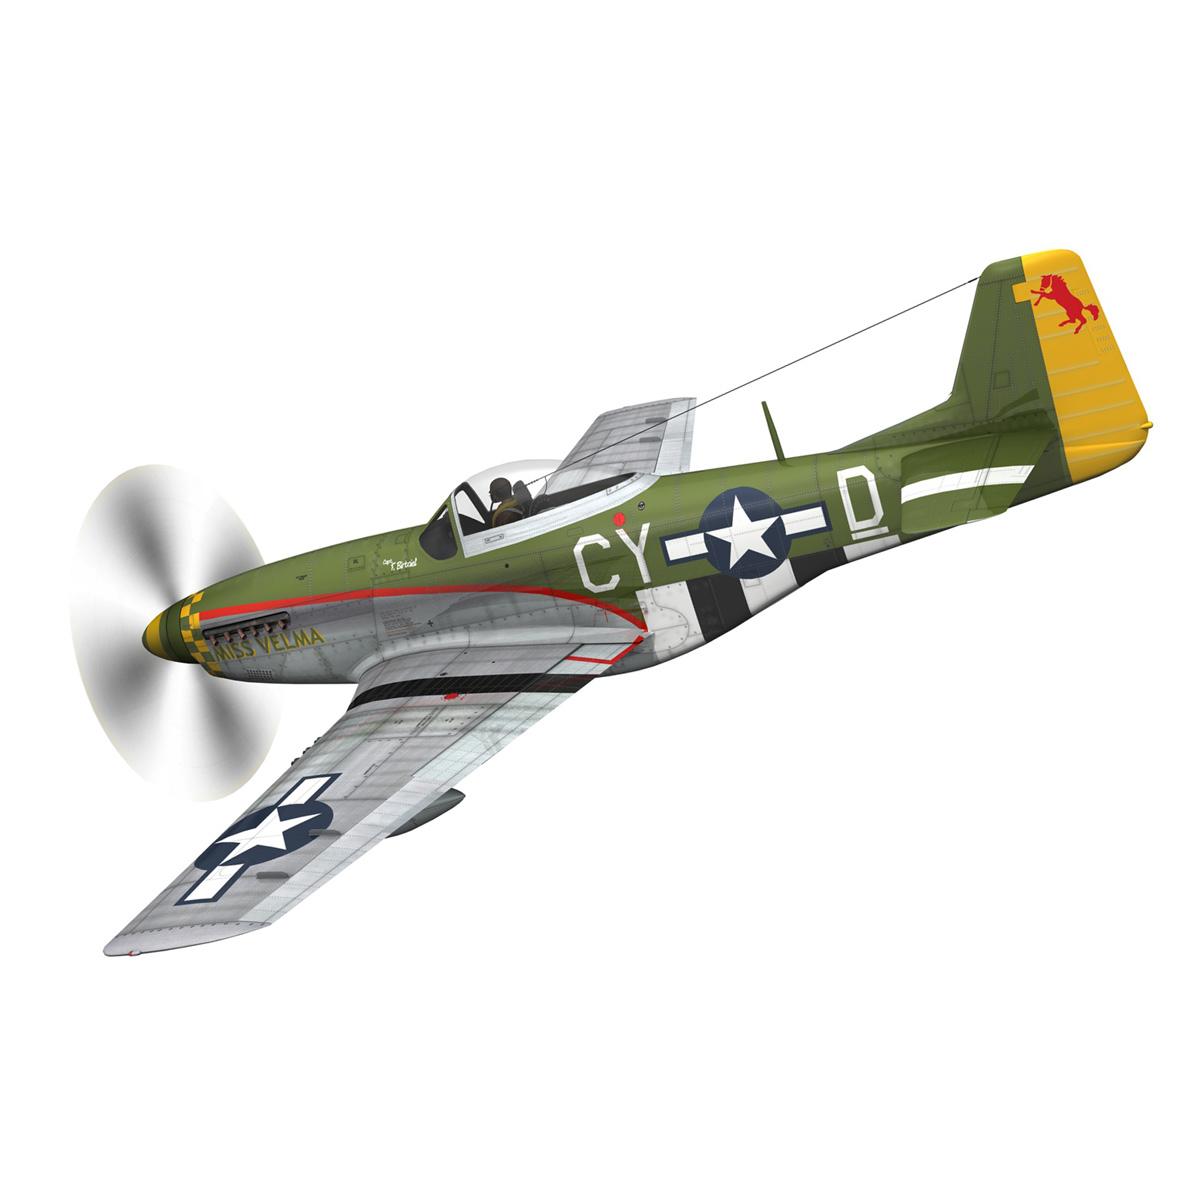 north american p-51d – mustang – miss velma 3d model 3ds fbx c4d lwo obj 267620